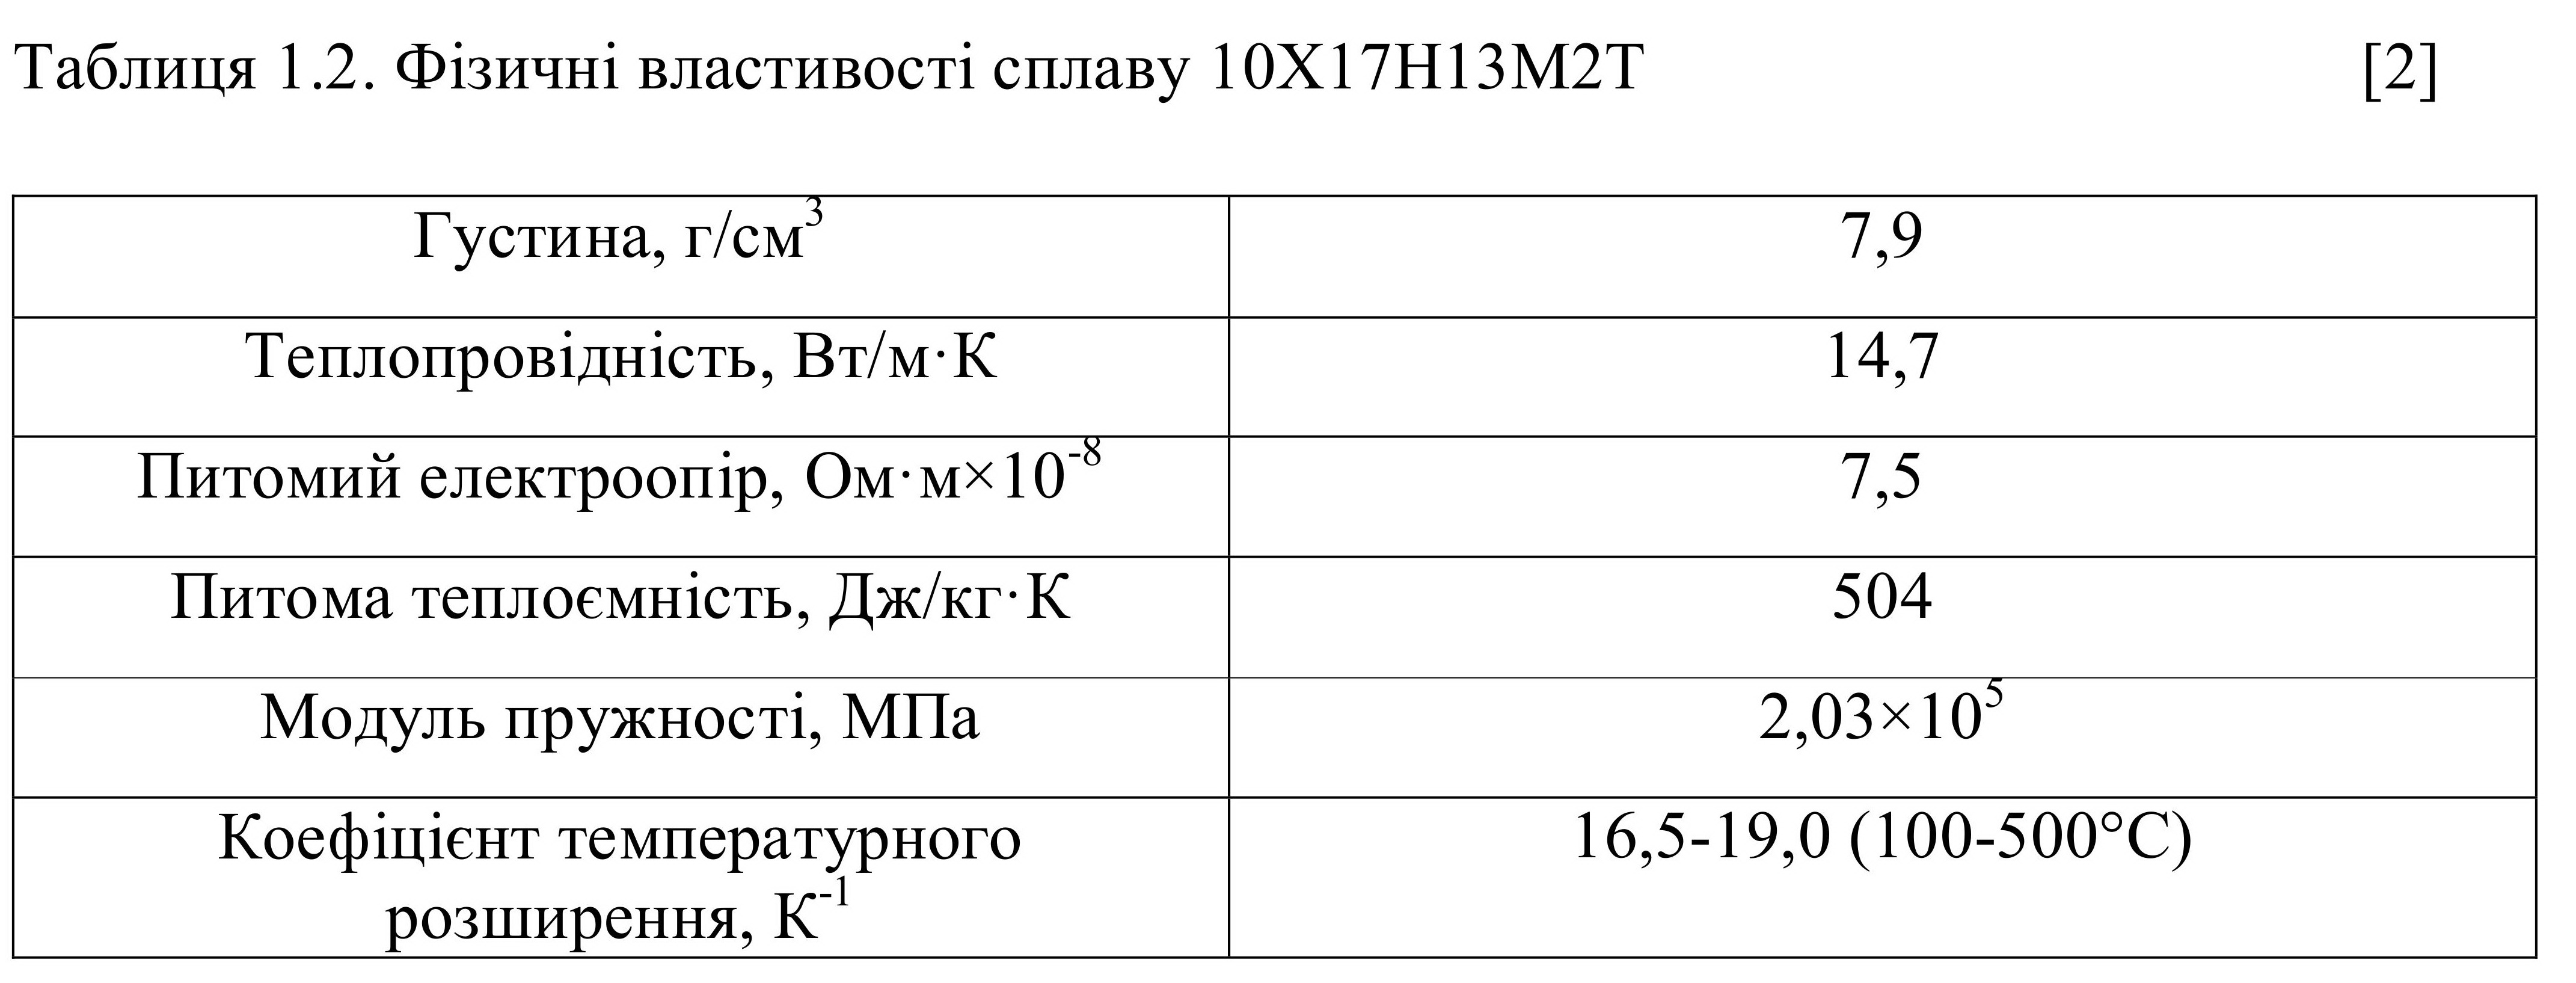 10х17н13м2т, особливості, особенности, сварка, физические, свойства